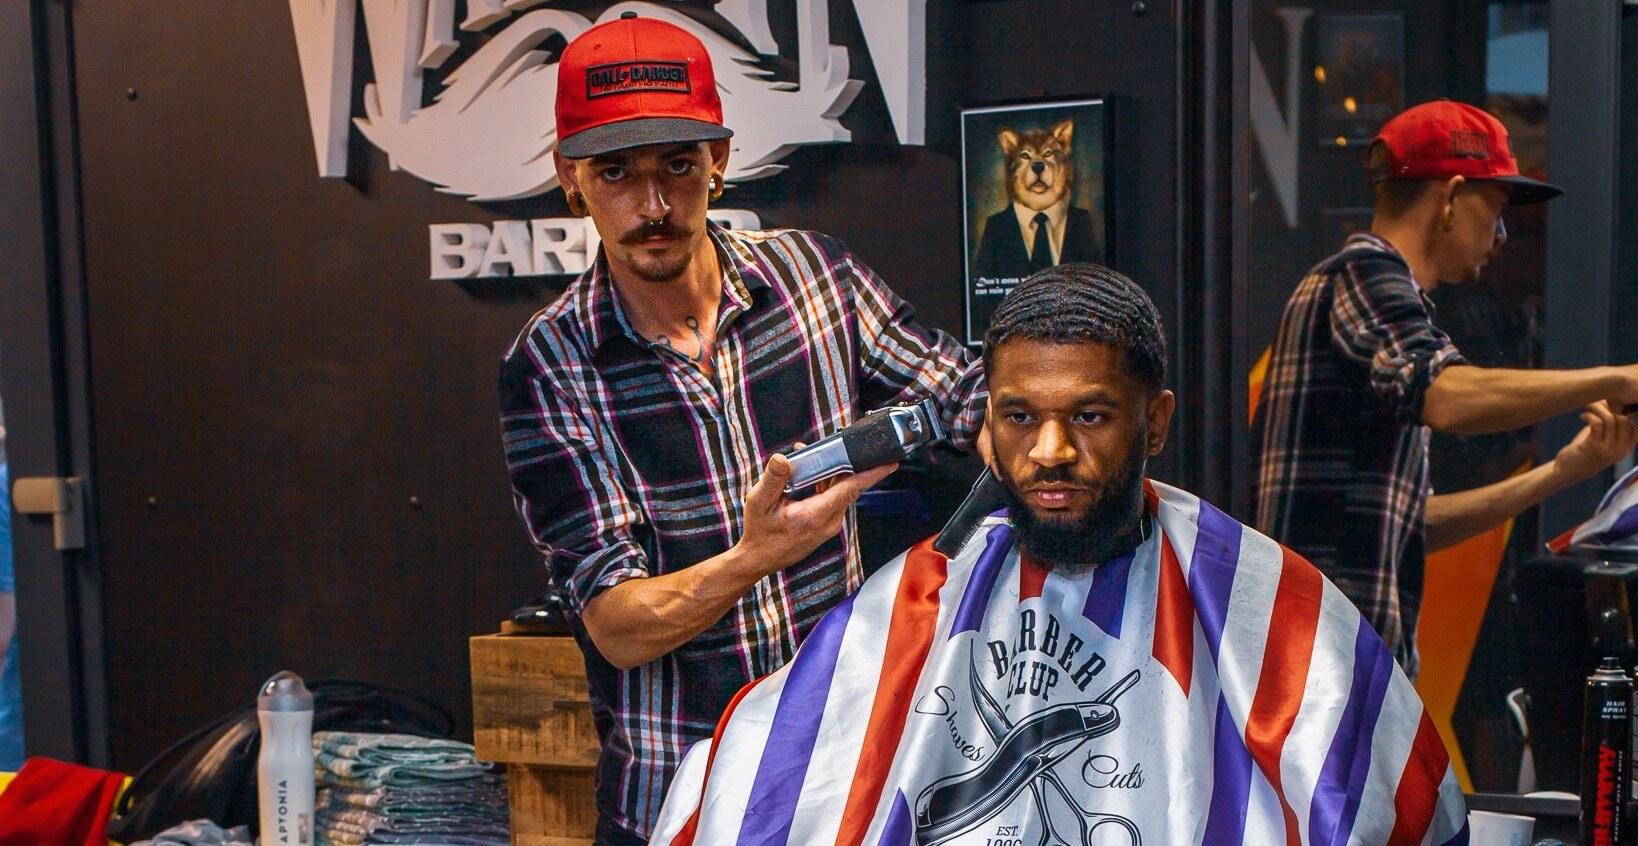 The Original Barber